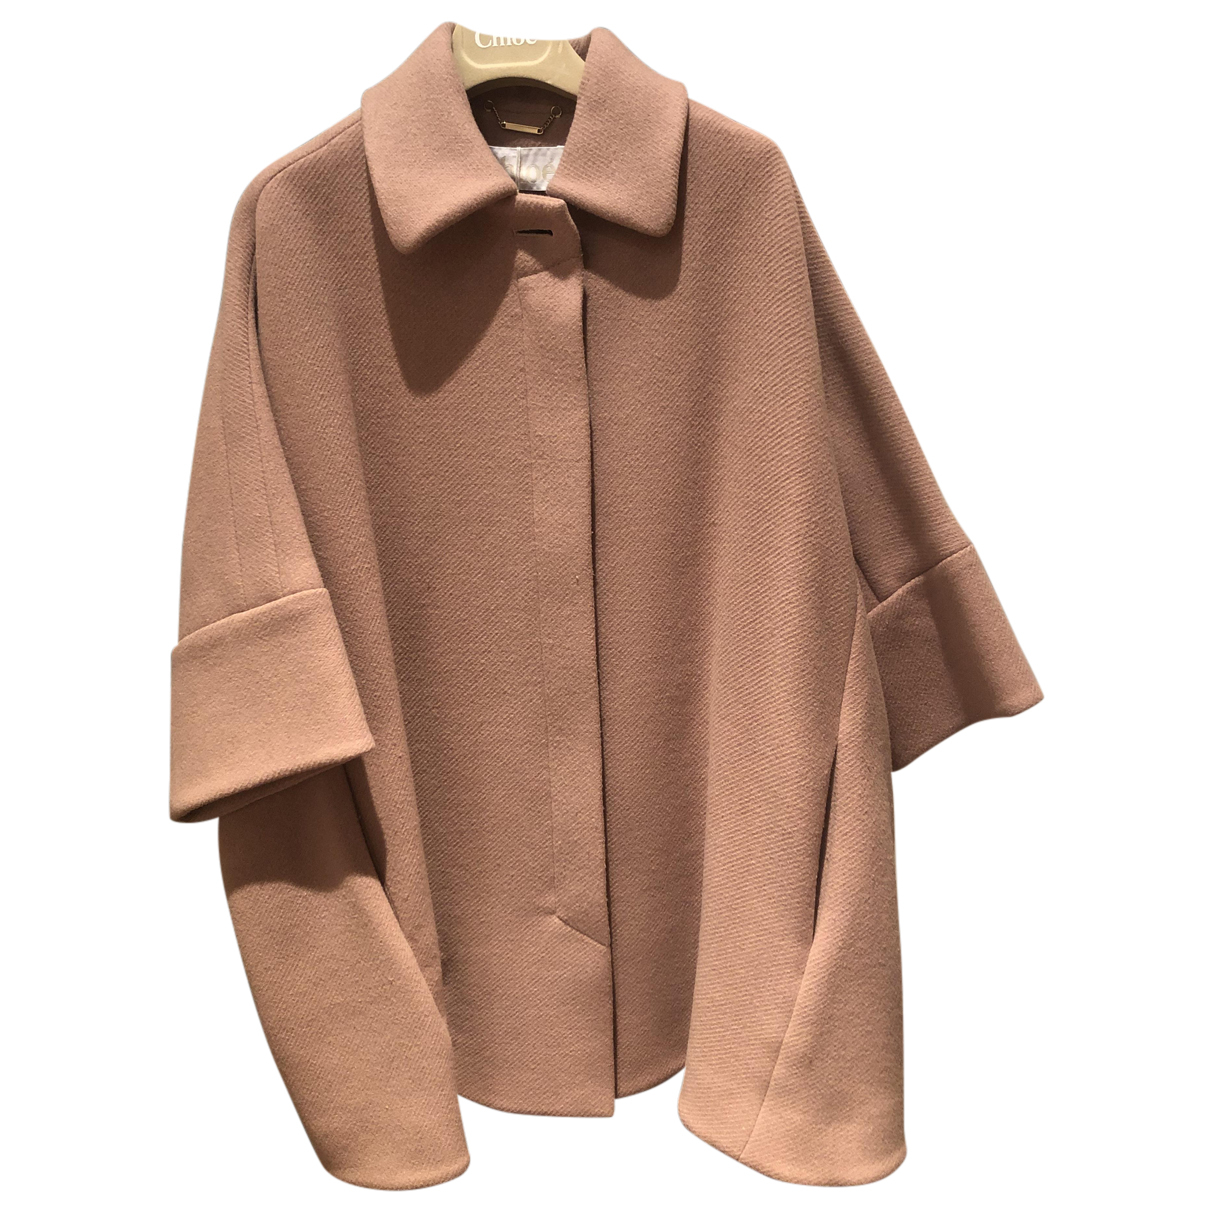 Chloé N Camel Wool coat for Women 36 FR